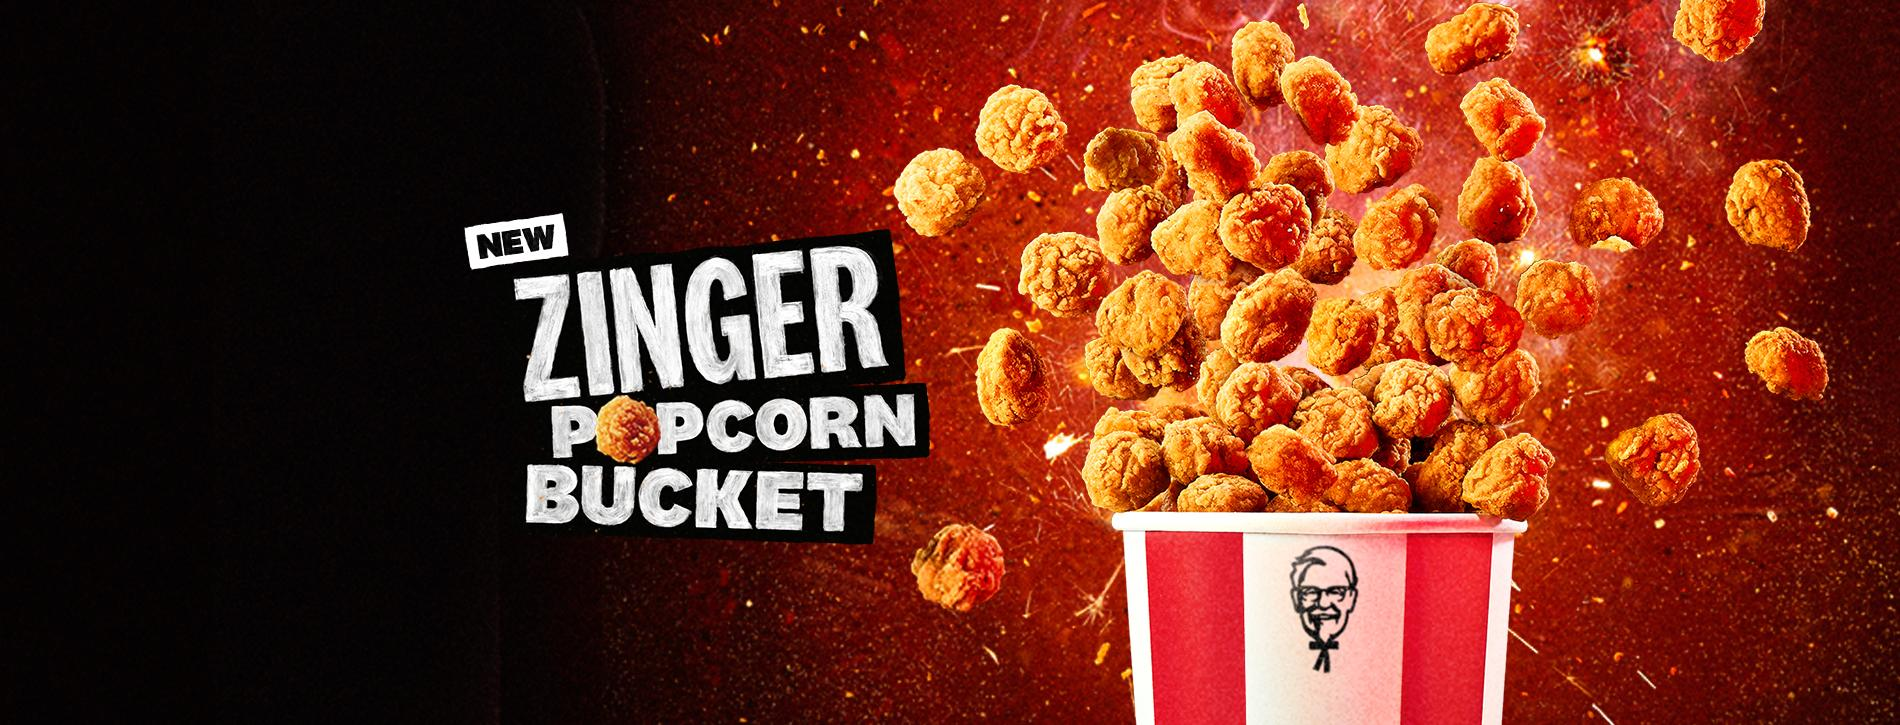 Zinger Popcorn